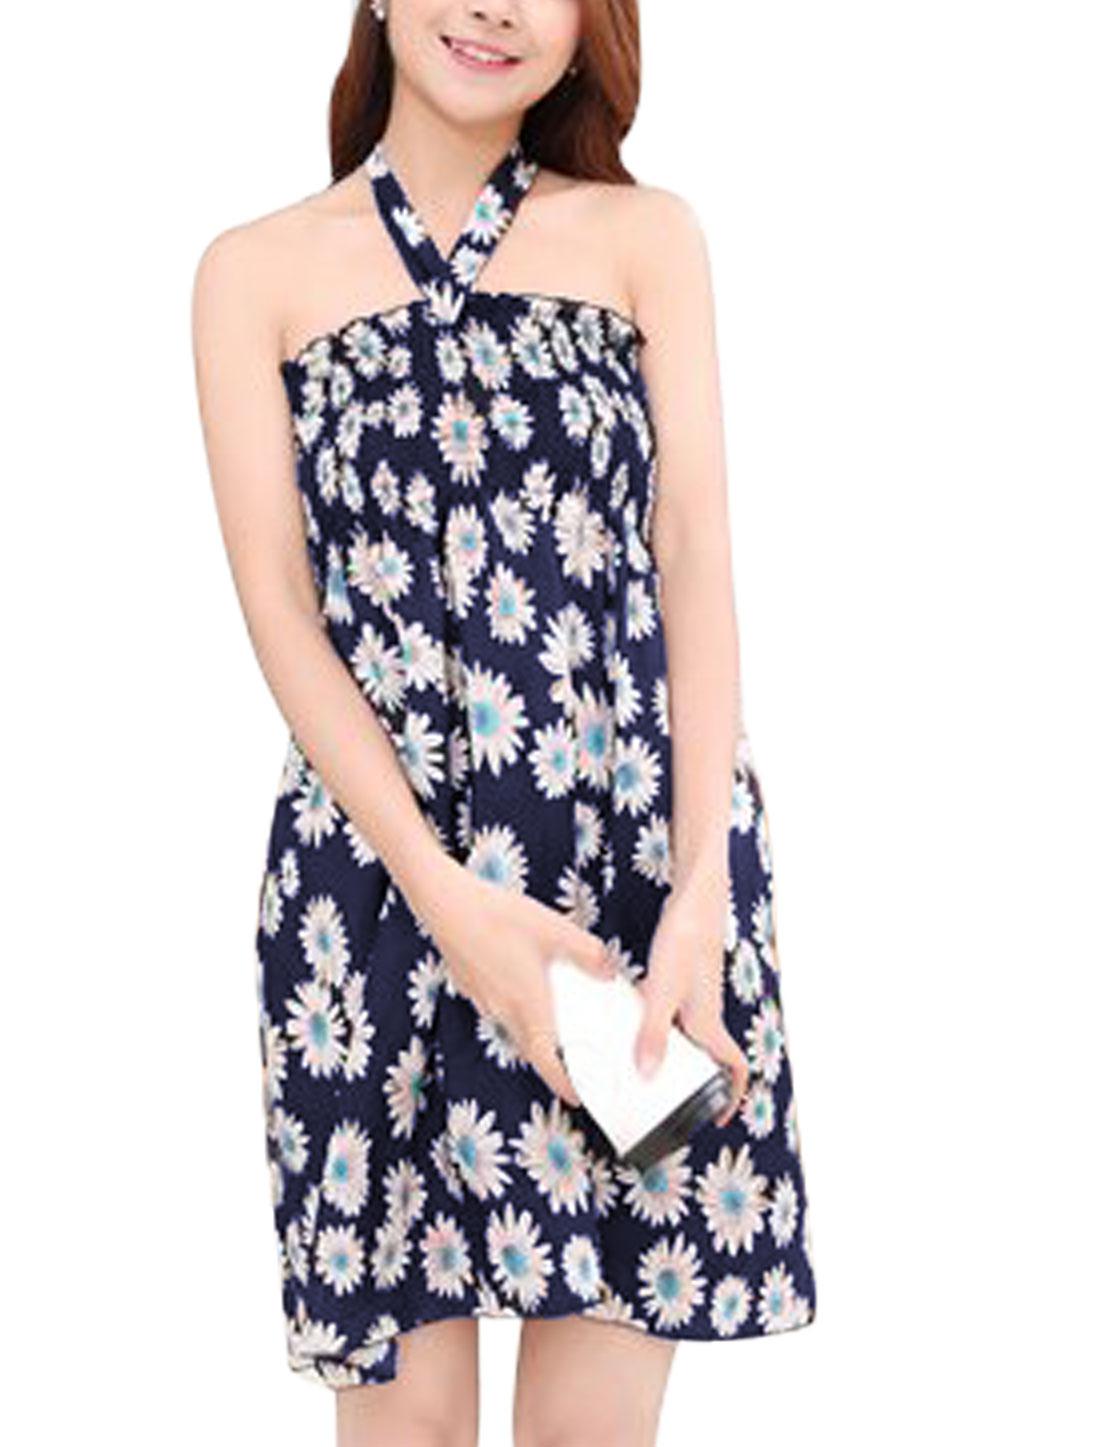 Woman Flower Prints Halter Neck Smocking Bust Sundress Navy Blue S